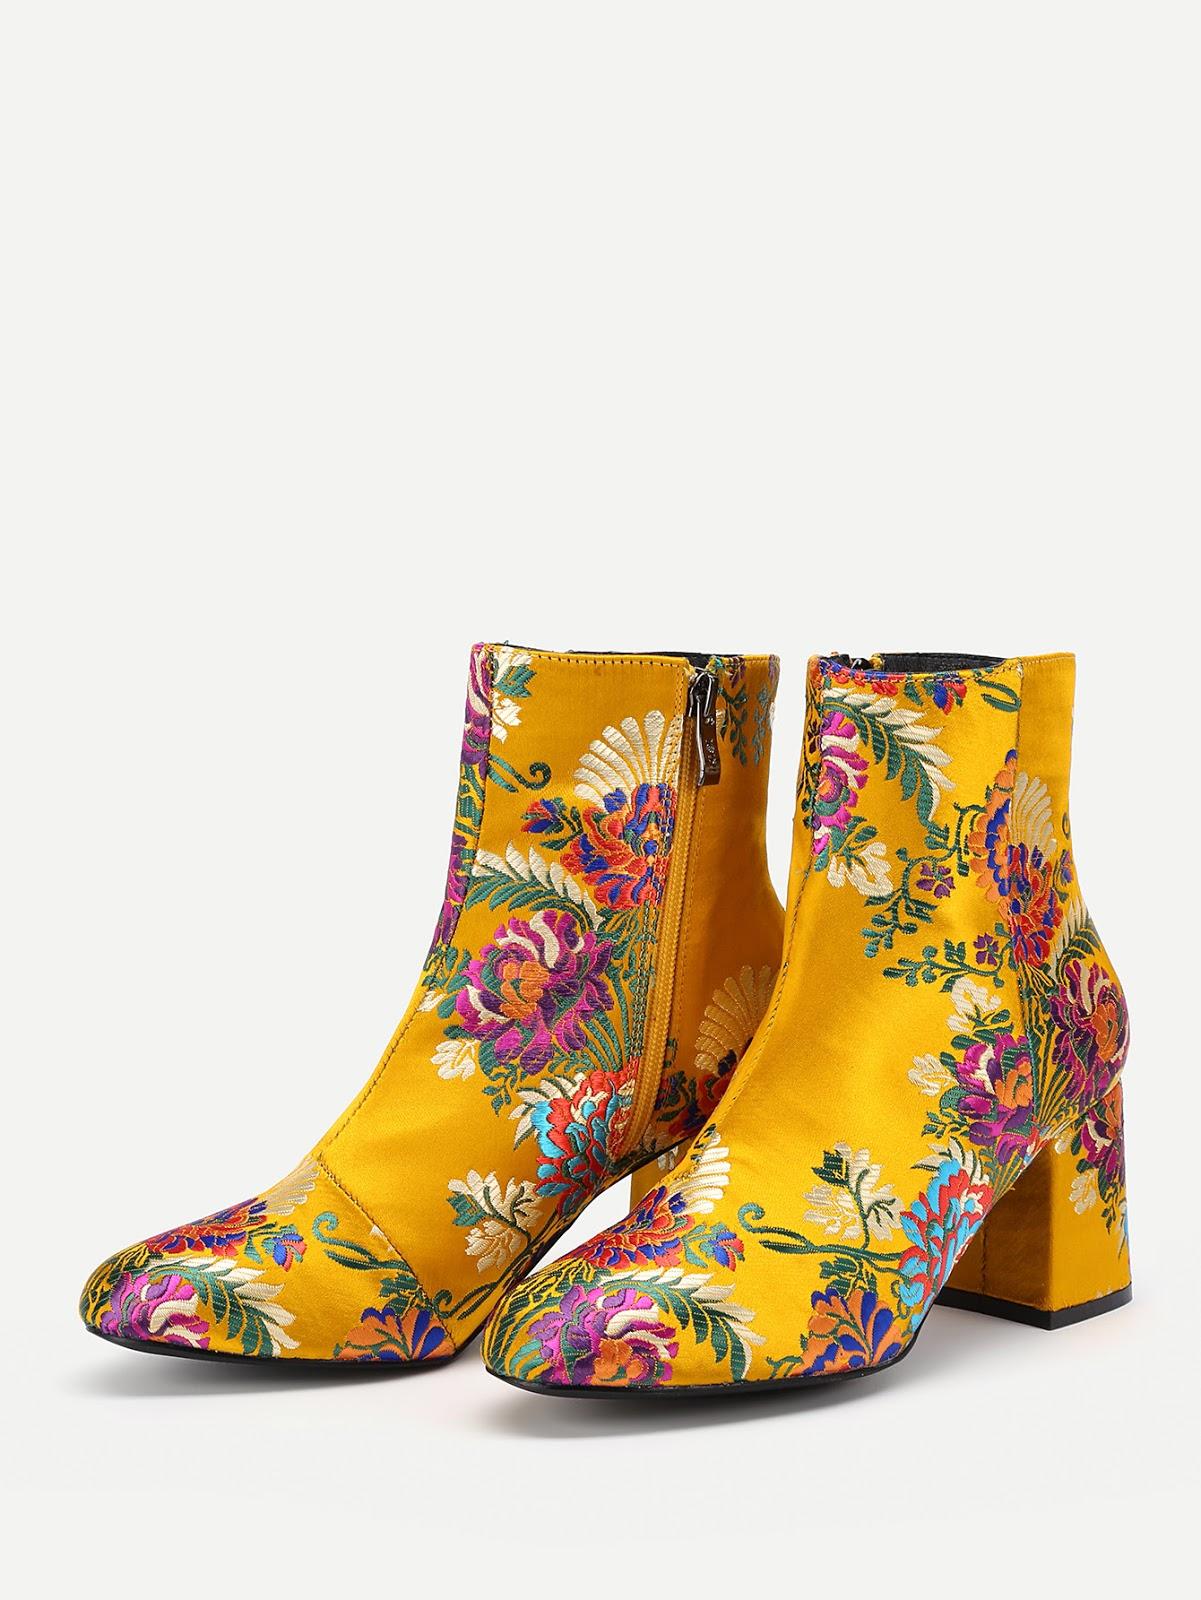 botines amarillos